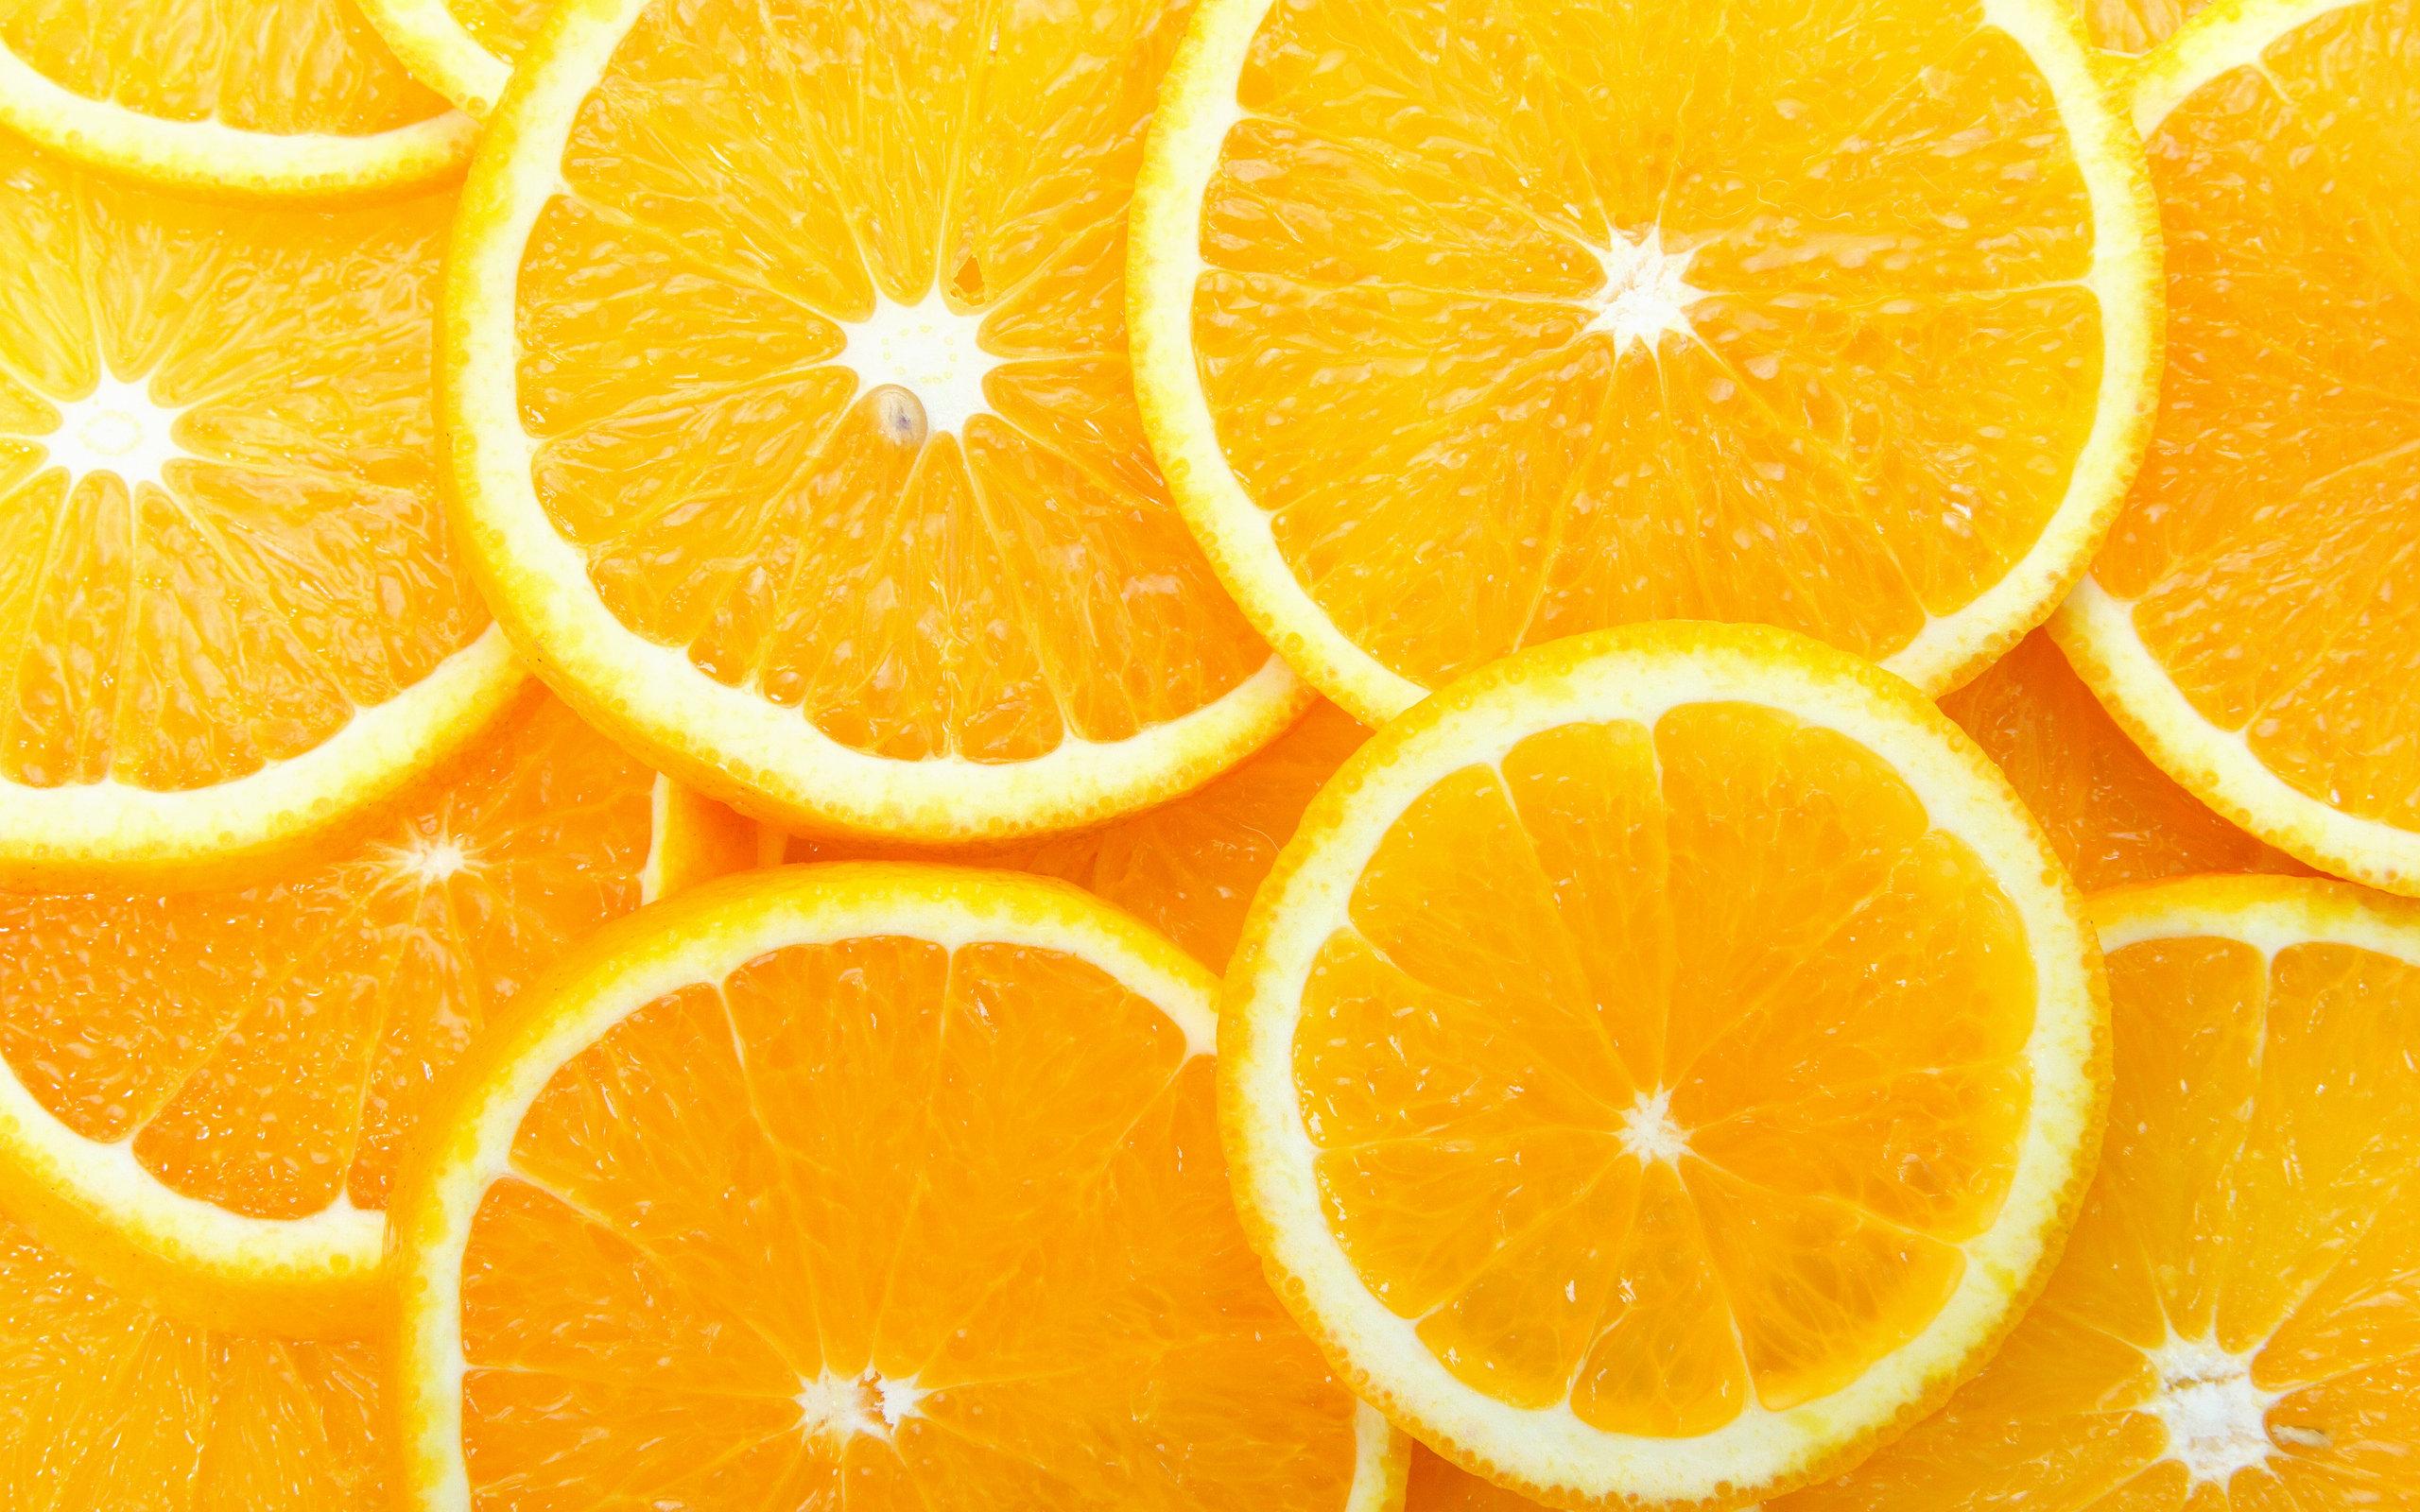 lemons-26125-26810-hd-wallpapers